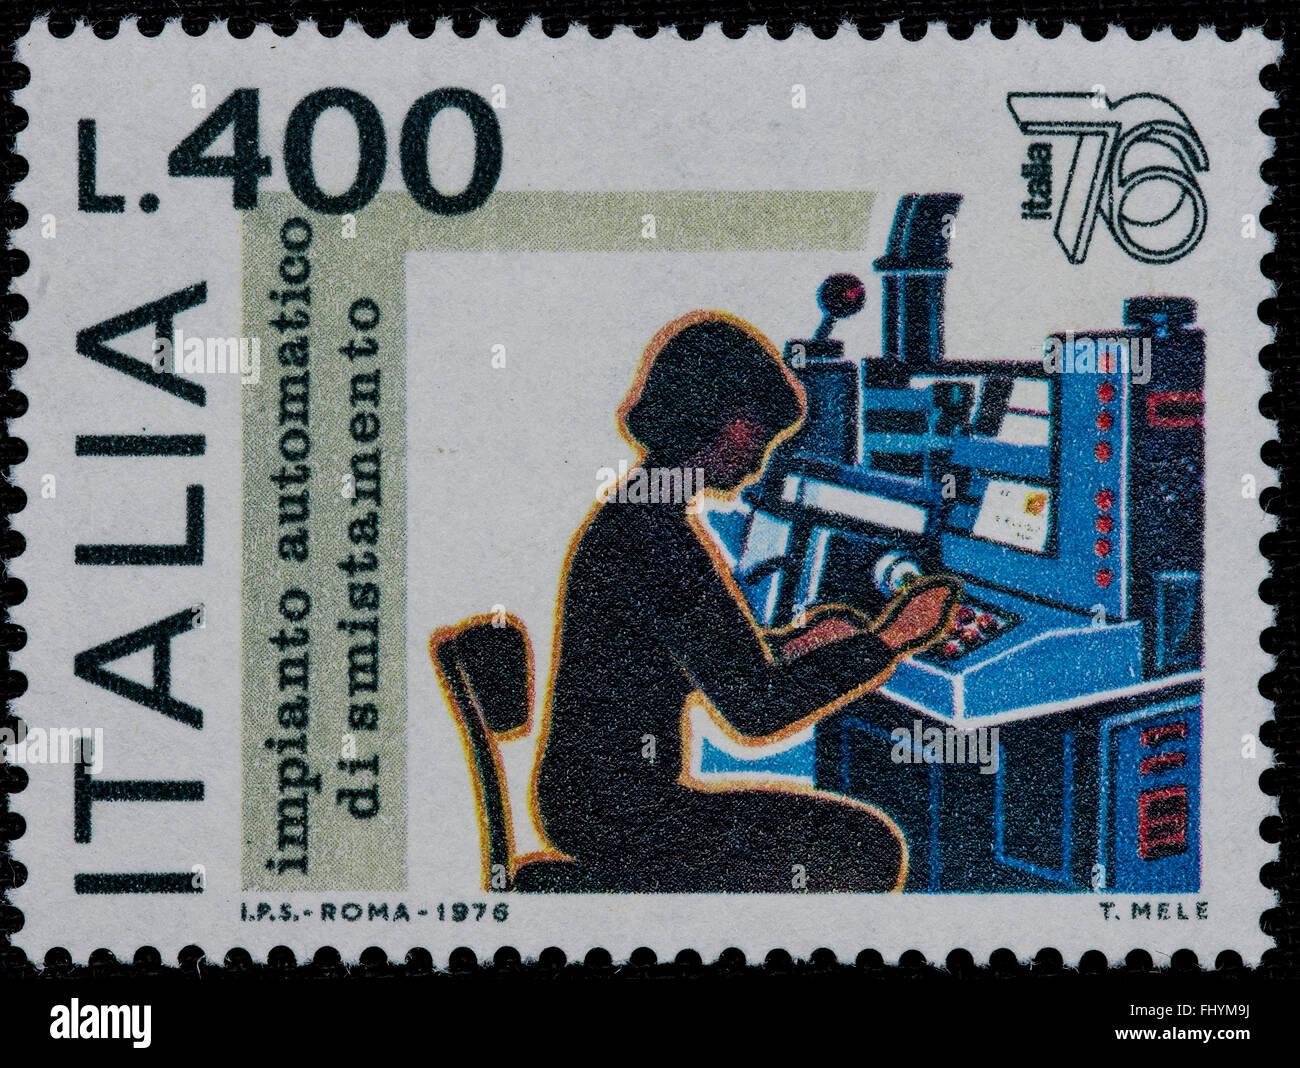 1976 Italian mint stamp issued to celebrate Italia 76 philatelic expo Lire 400 - Stock Image